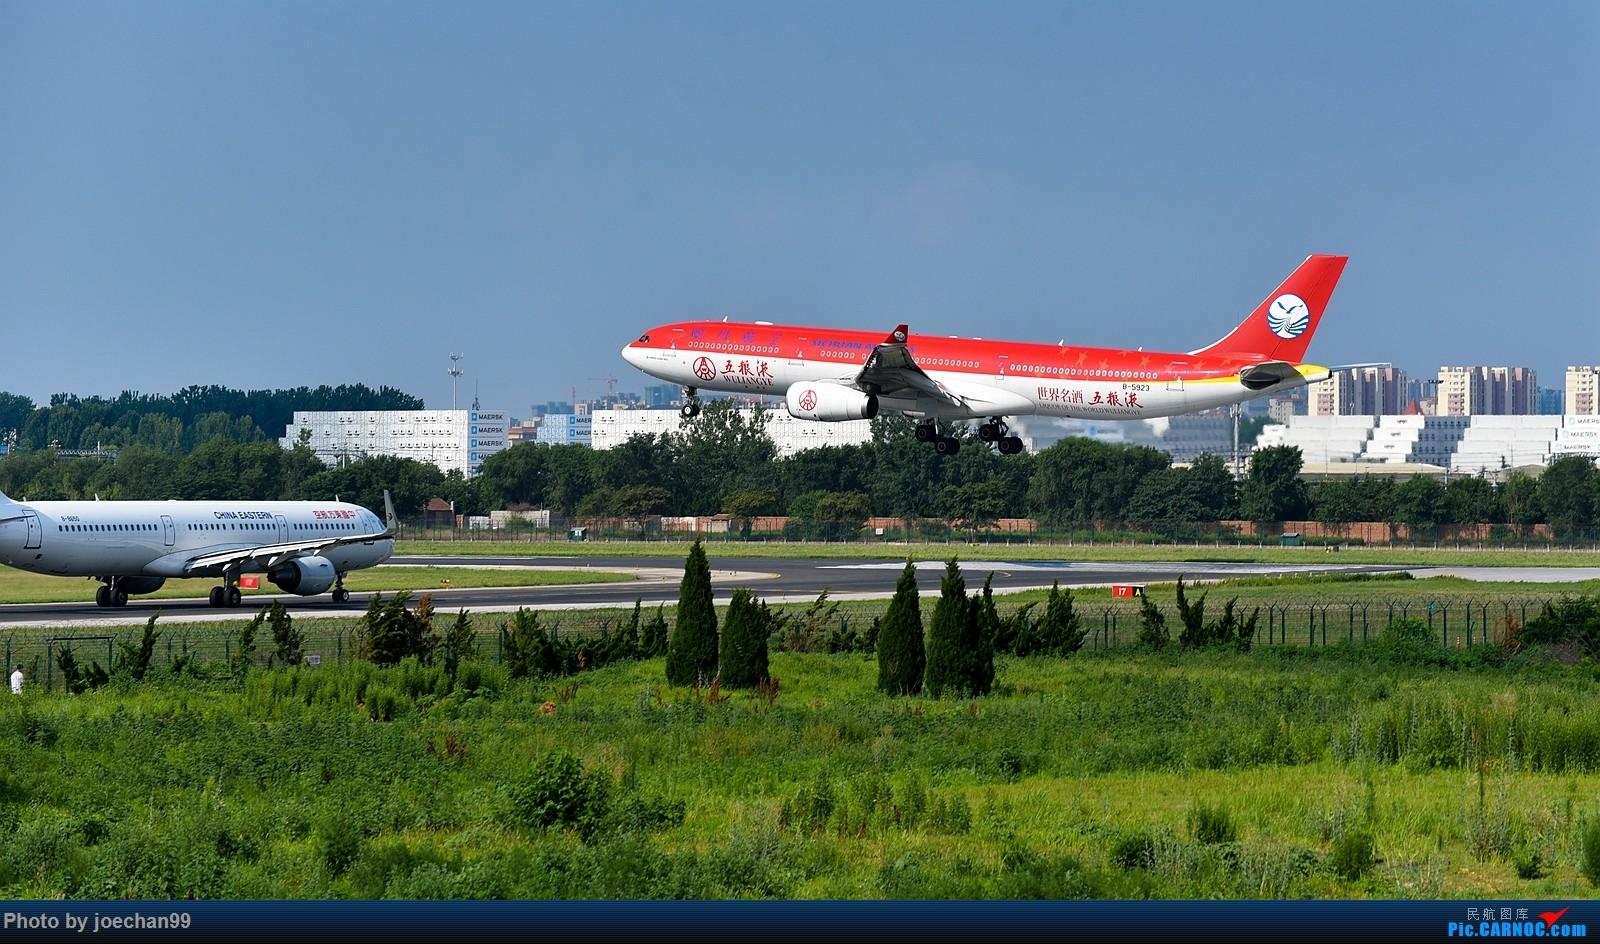 Re:[原创]TAO偶遇川航五粮液号、吉祥航空全红彩绘机 AIRBUS A330-300 B-5923 中国青岛流亭国际机场